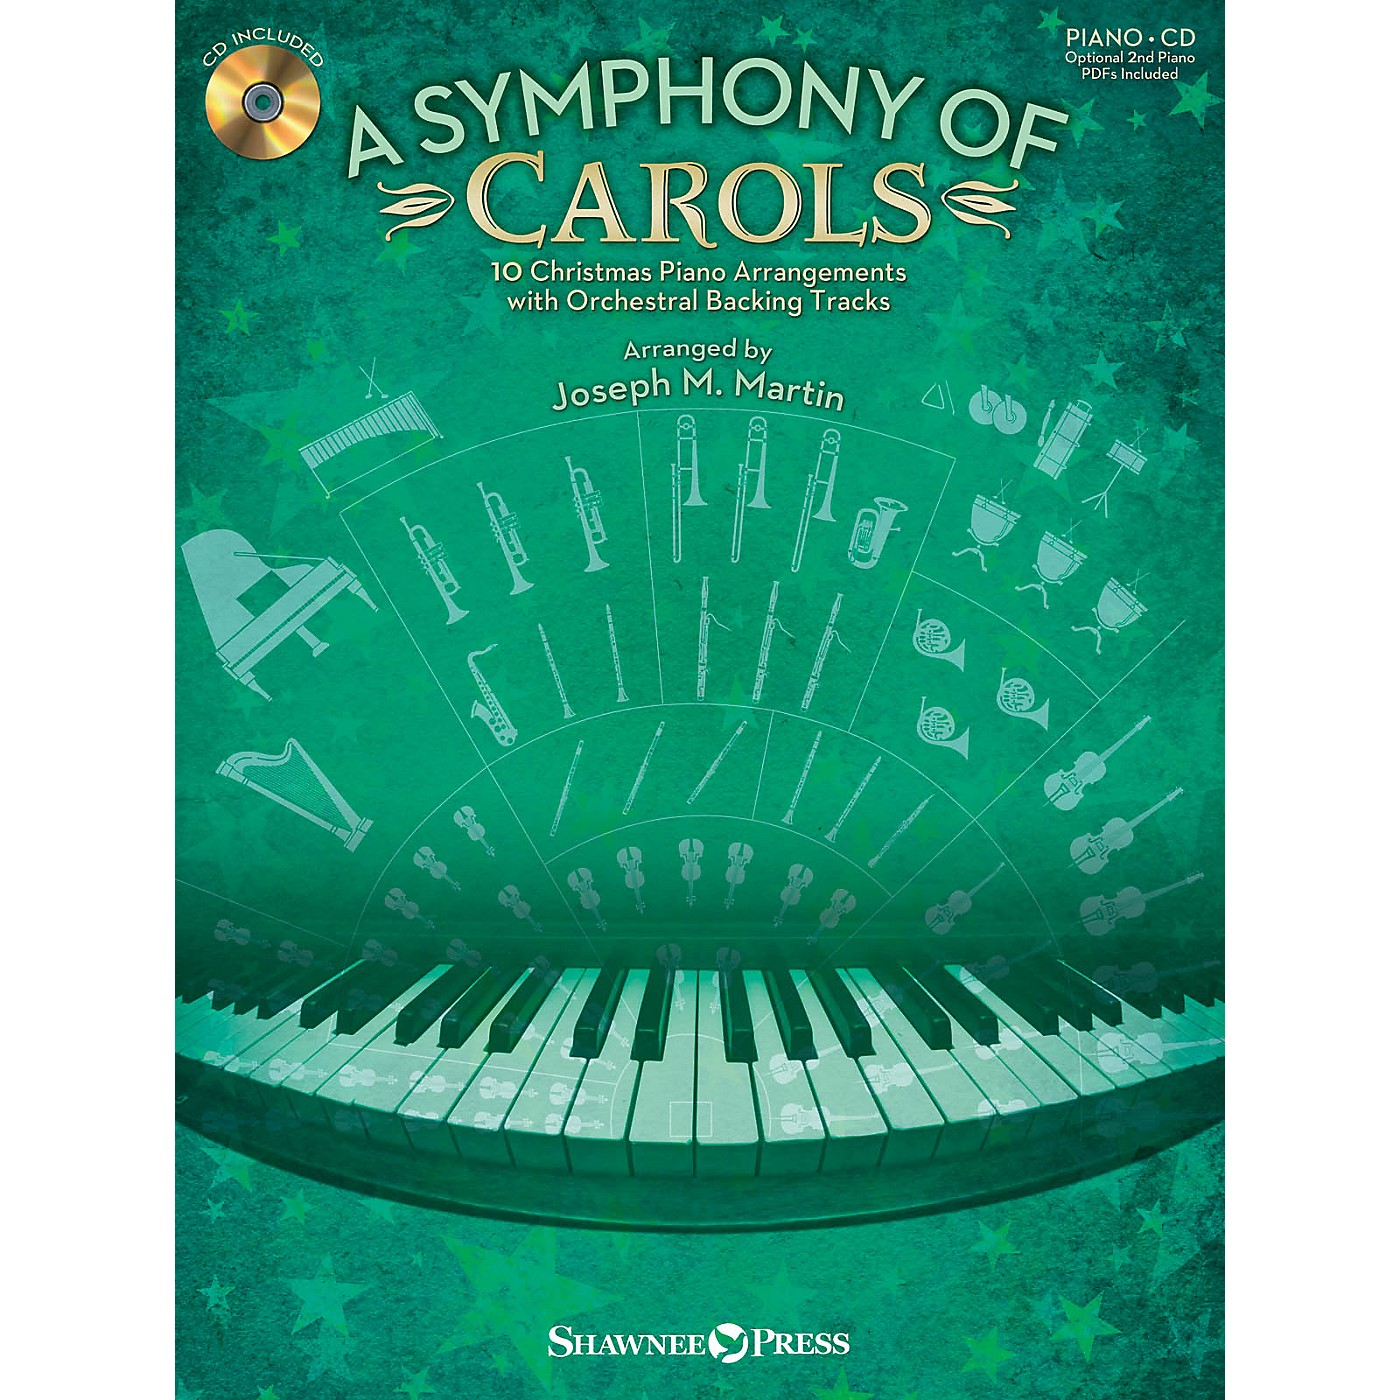 Shawnee Press A Symphony of Carols (10 Christmas Piano Arrangements with Full Orchestra Tracks) by Joseph M. Martin thumbnail